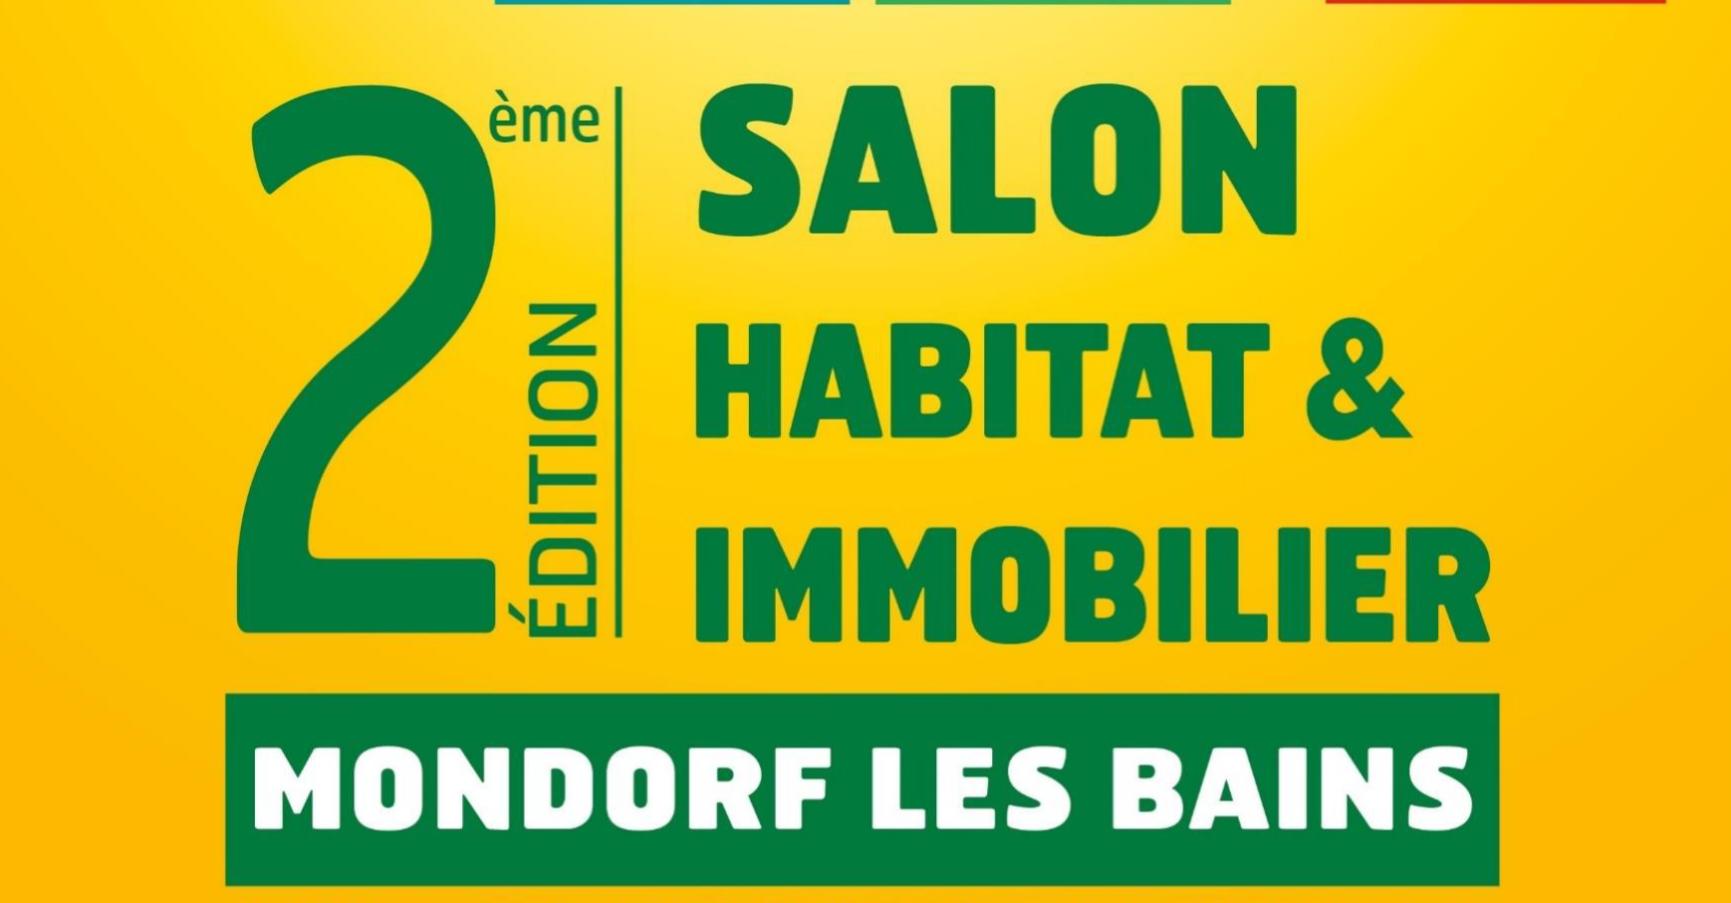 Salon Mondorf-les-bains mars 2018